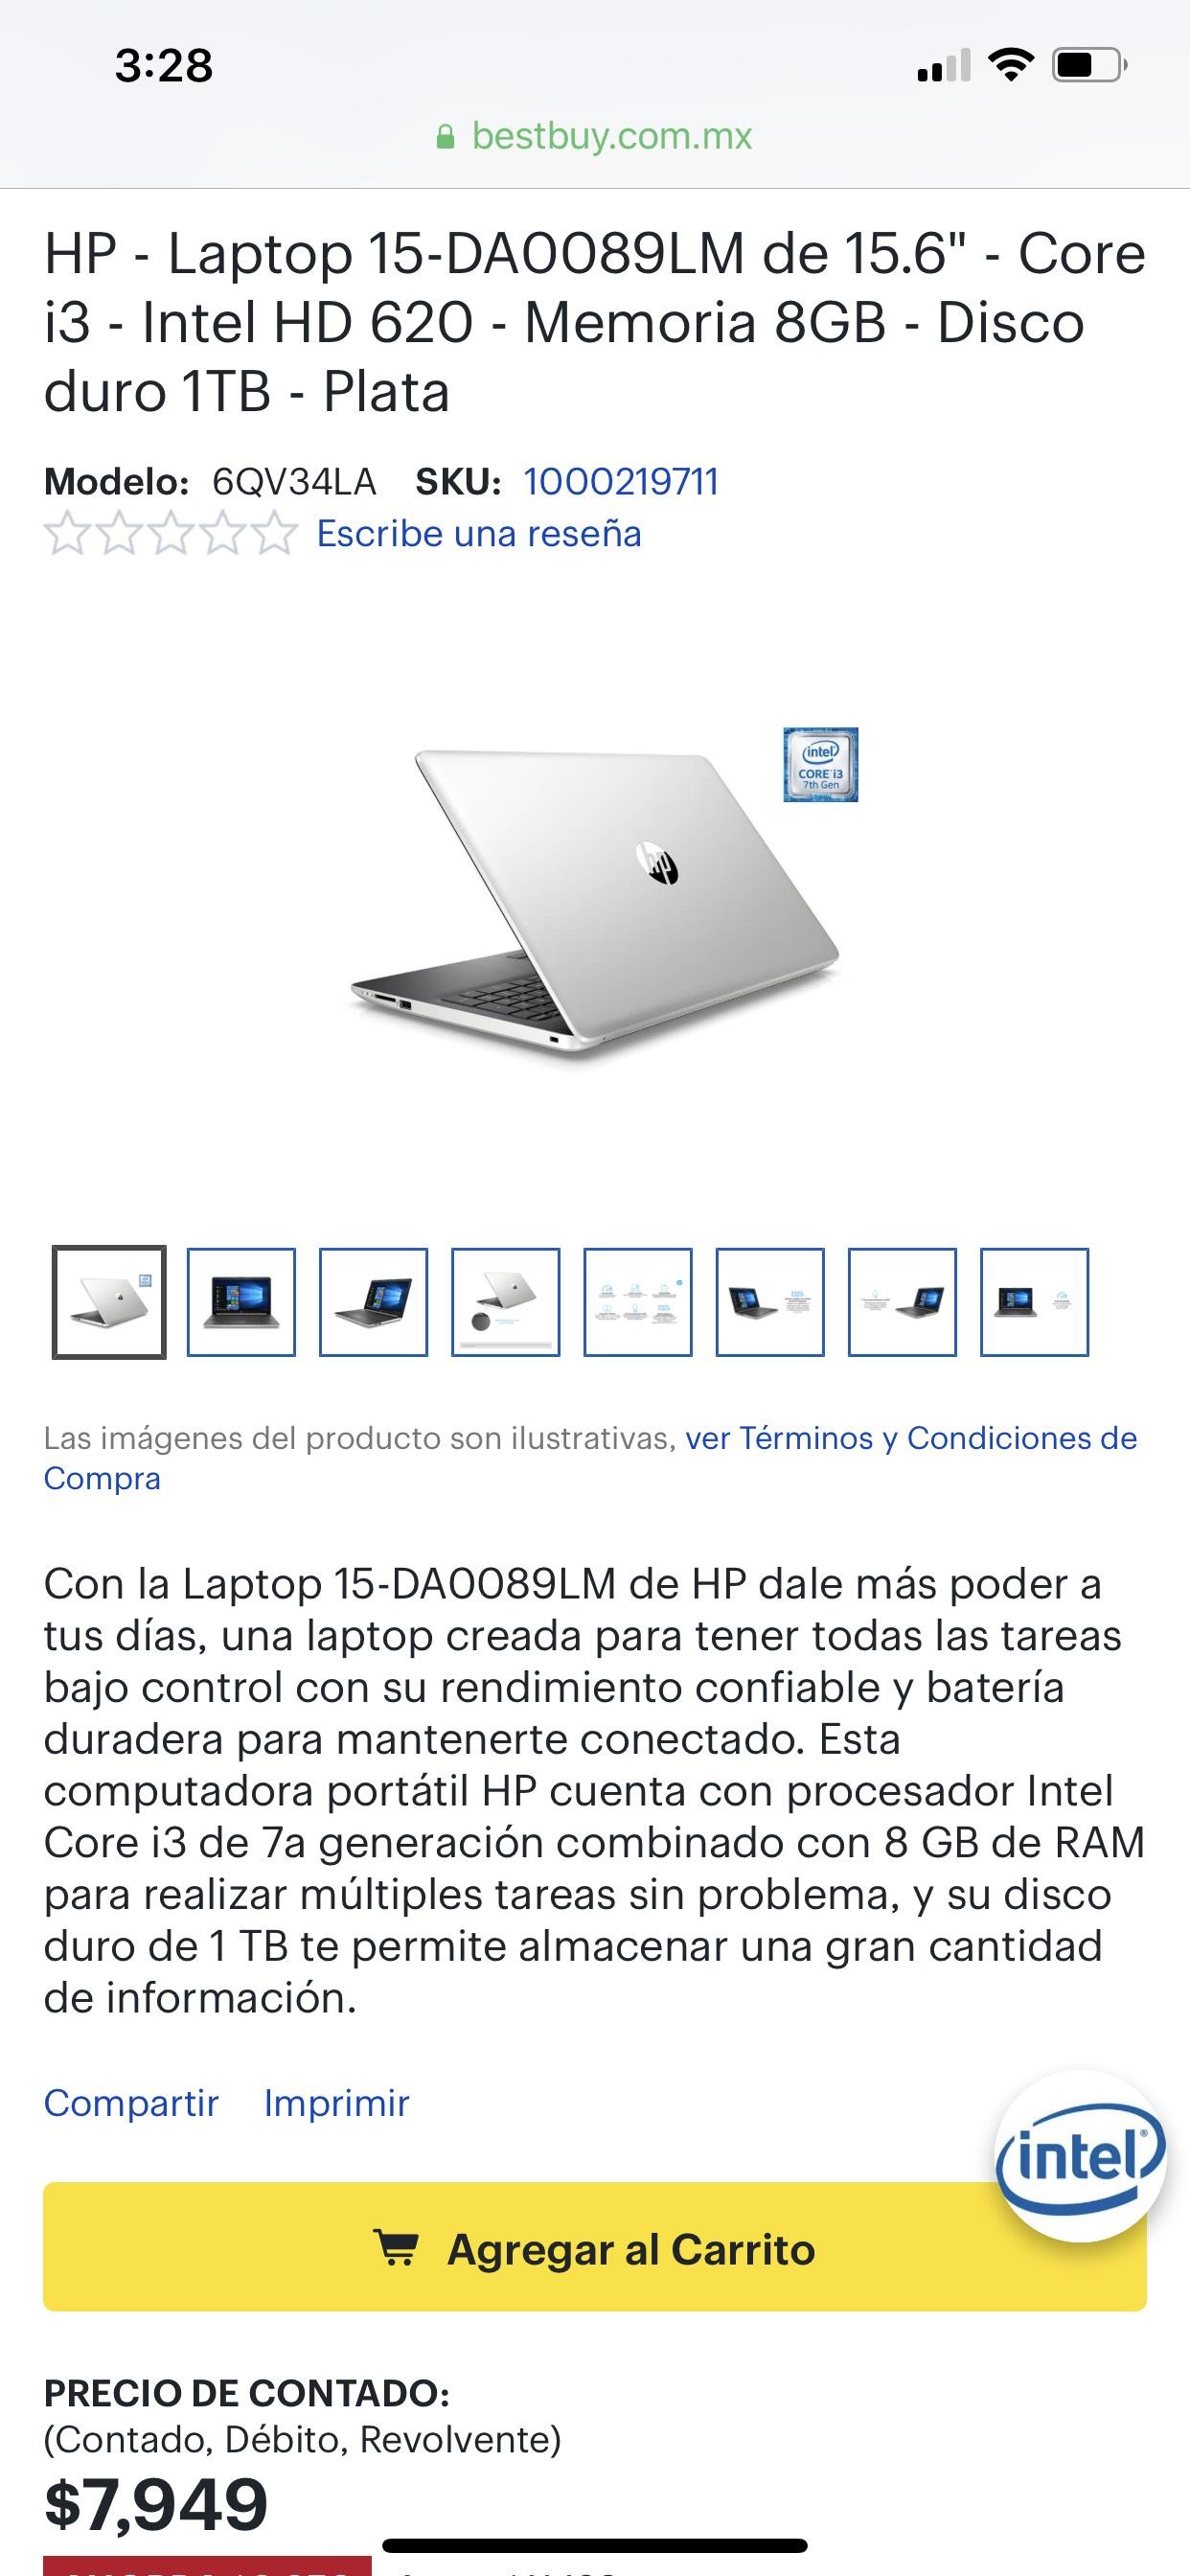 Best Buy Laptop hp procesador i3 8gb ram 1tb hdd a 24 msi con banamex